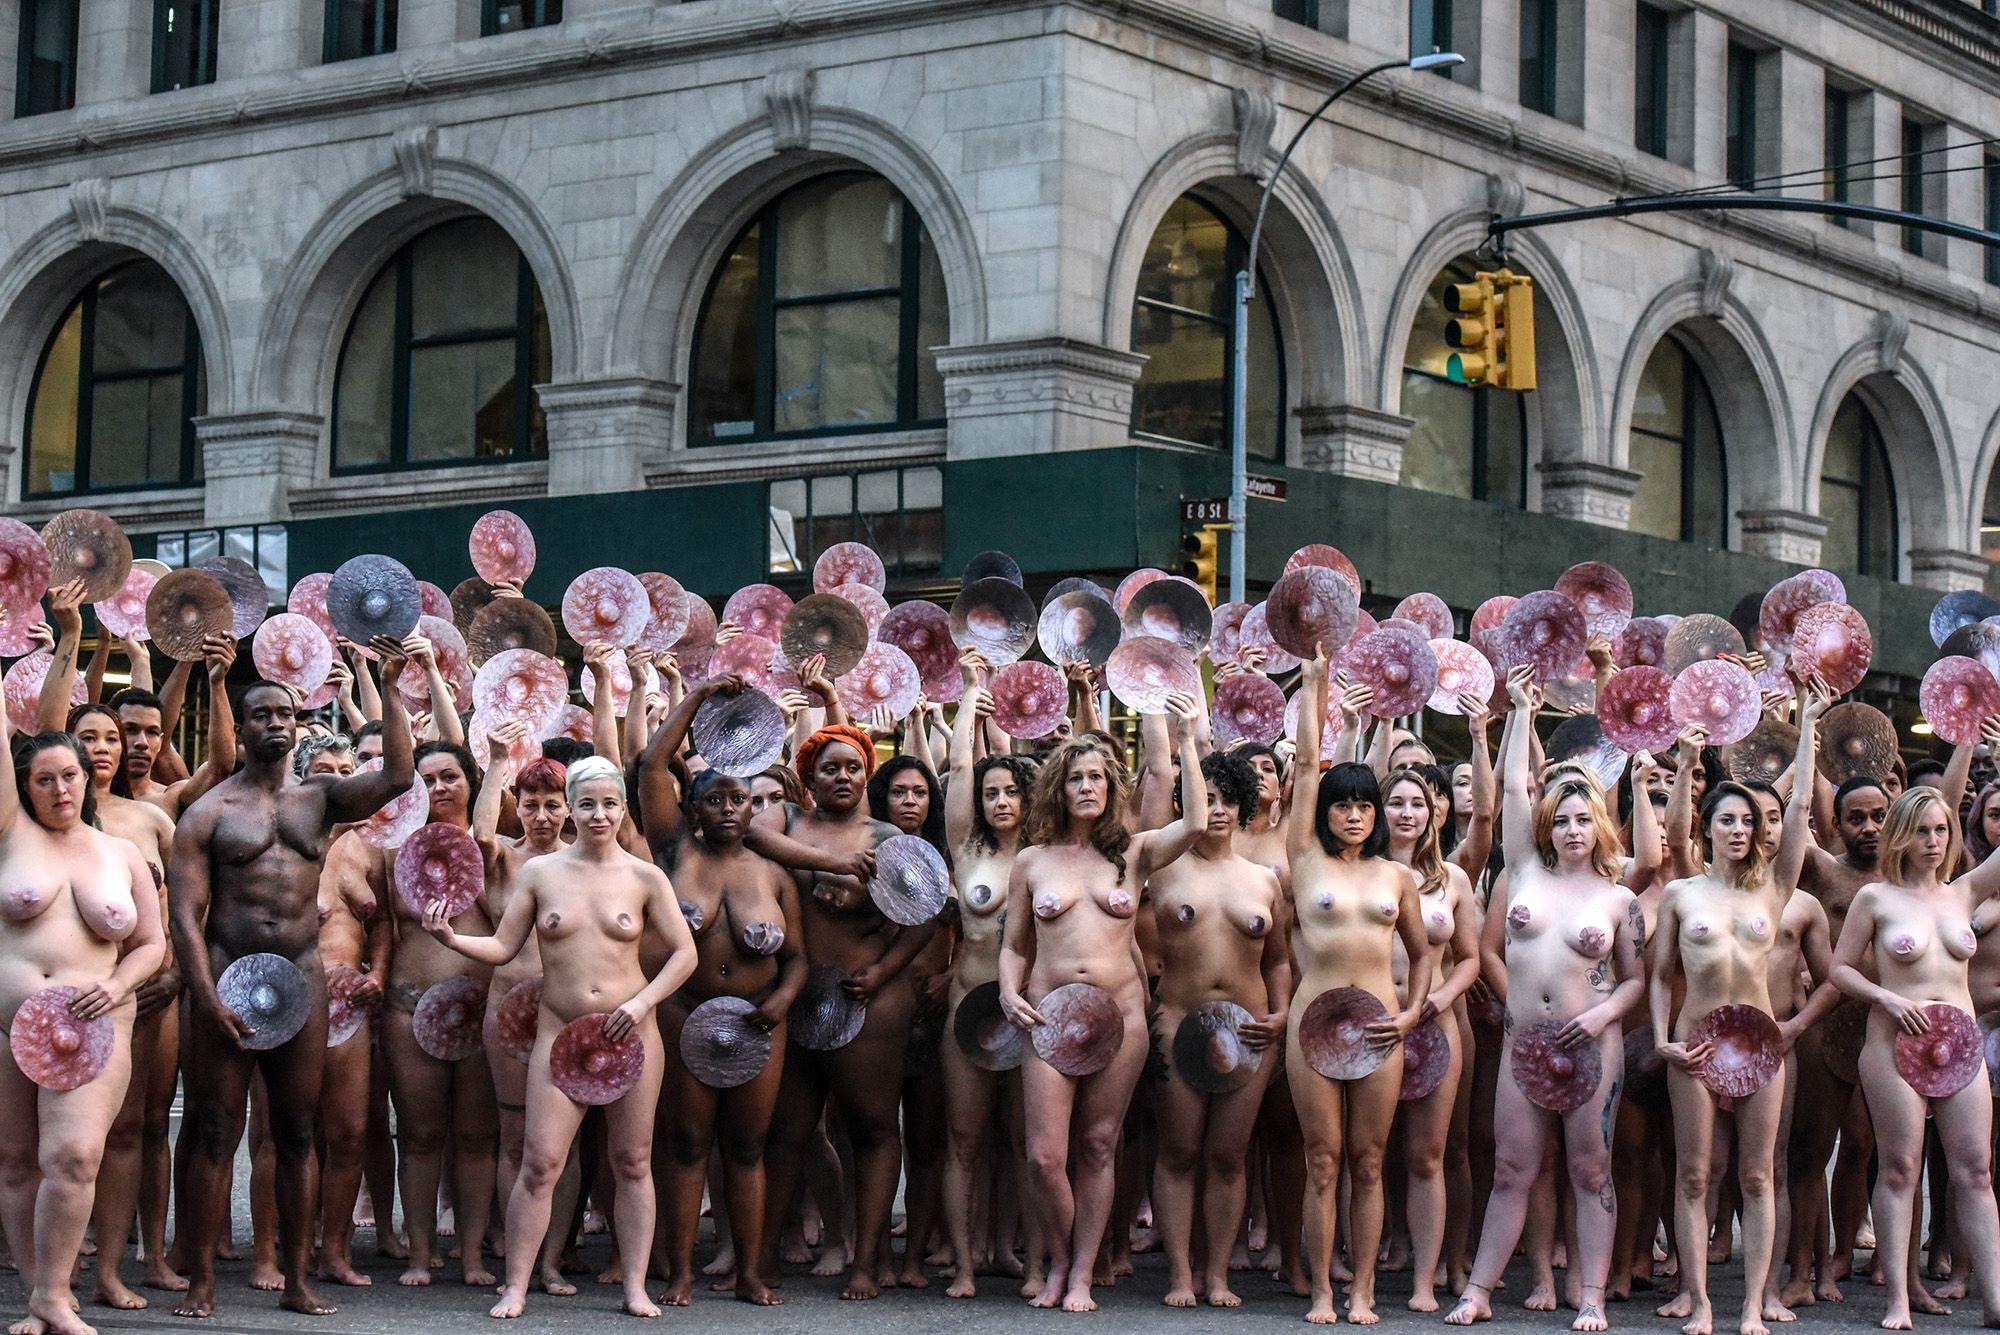 Group dutch girls naked public